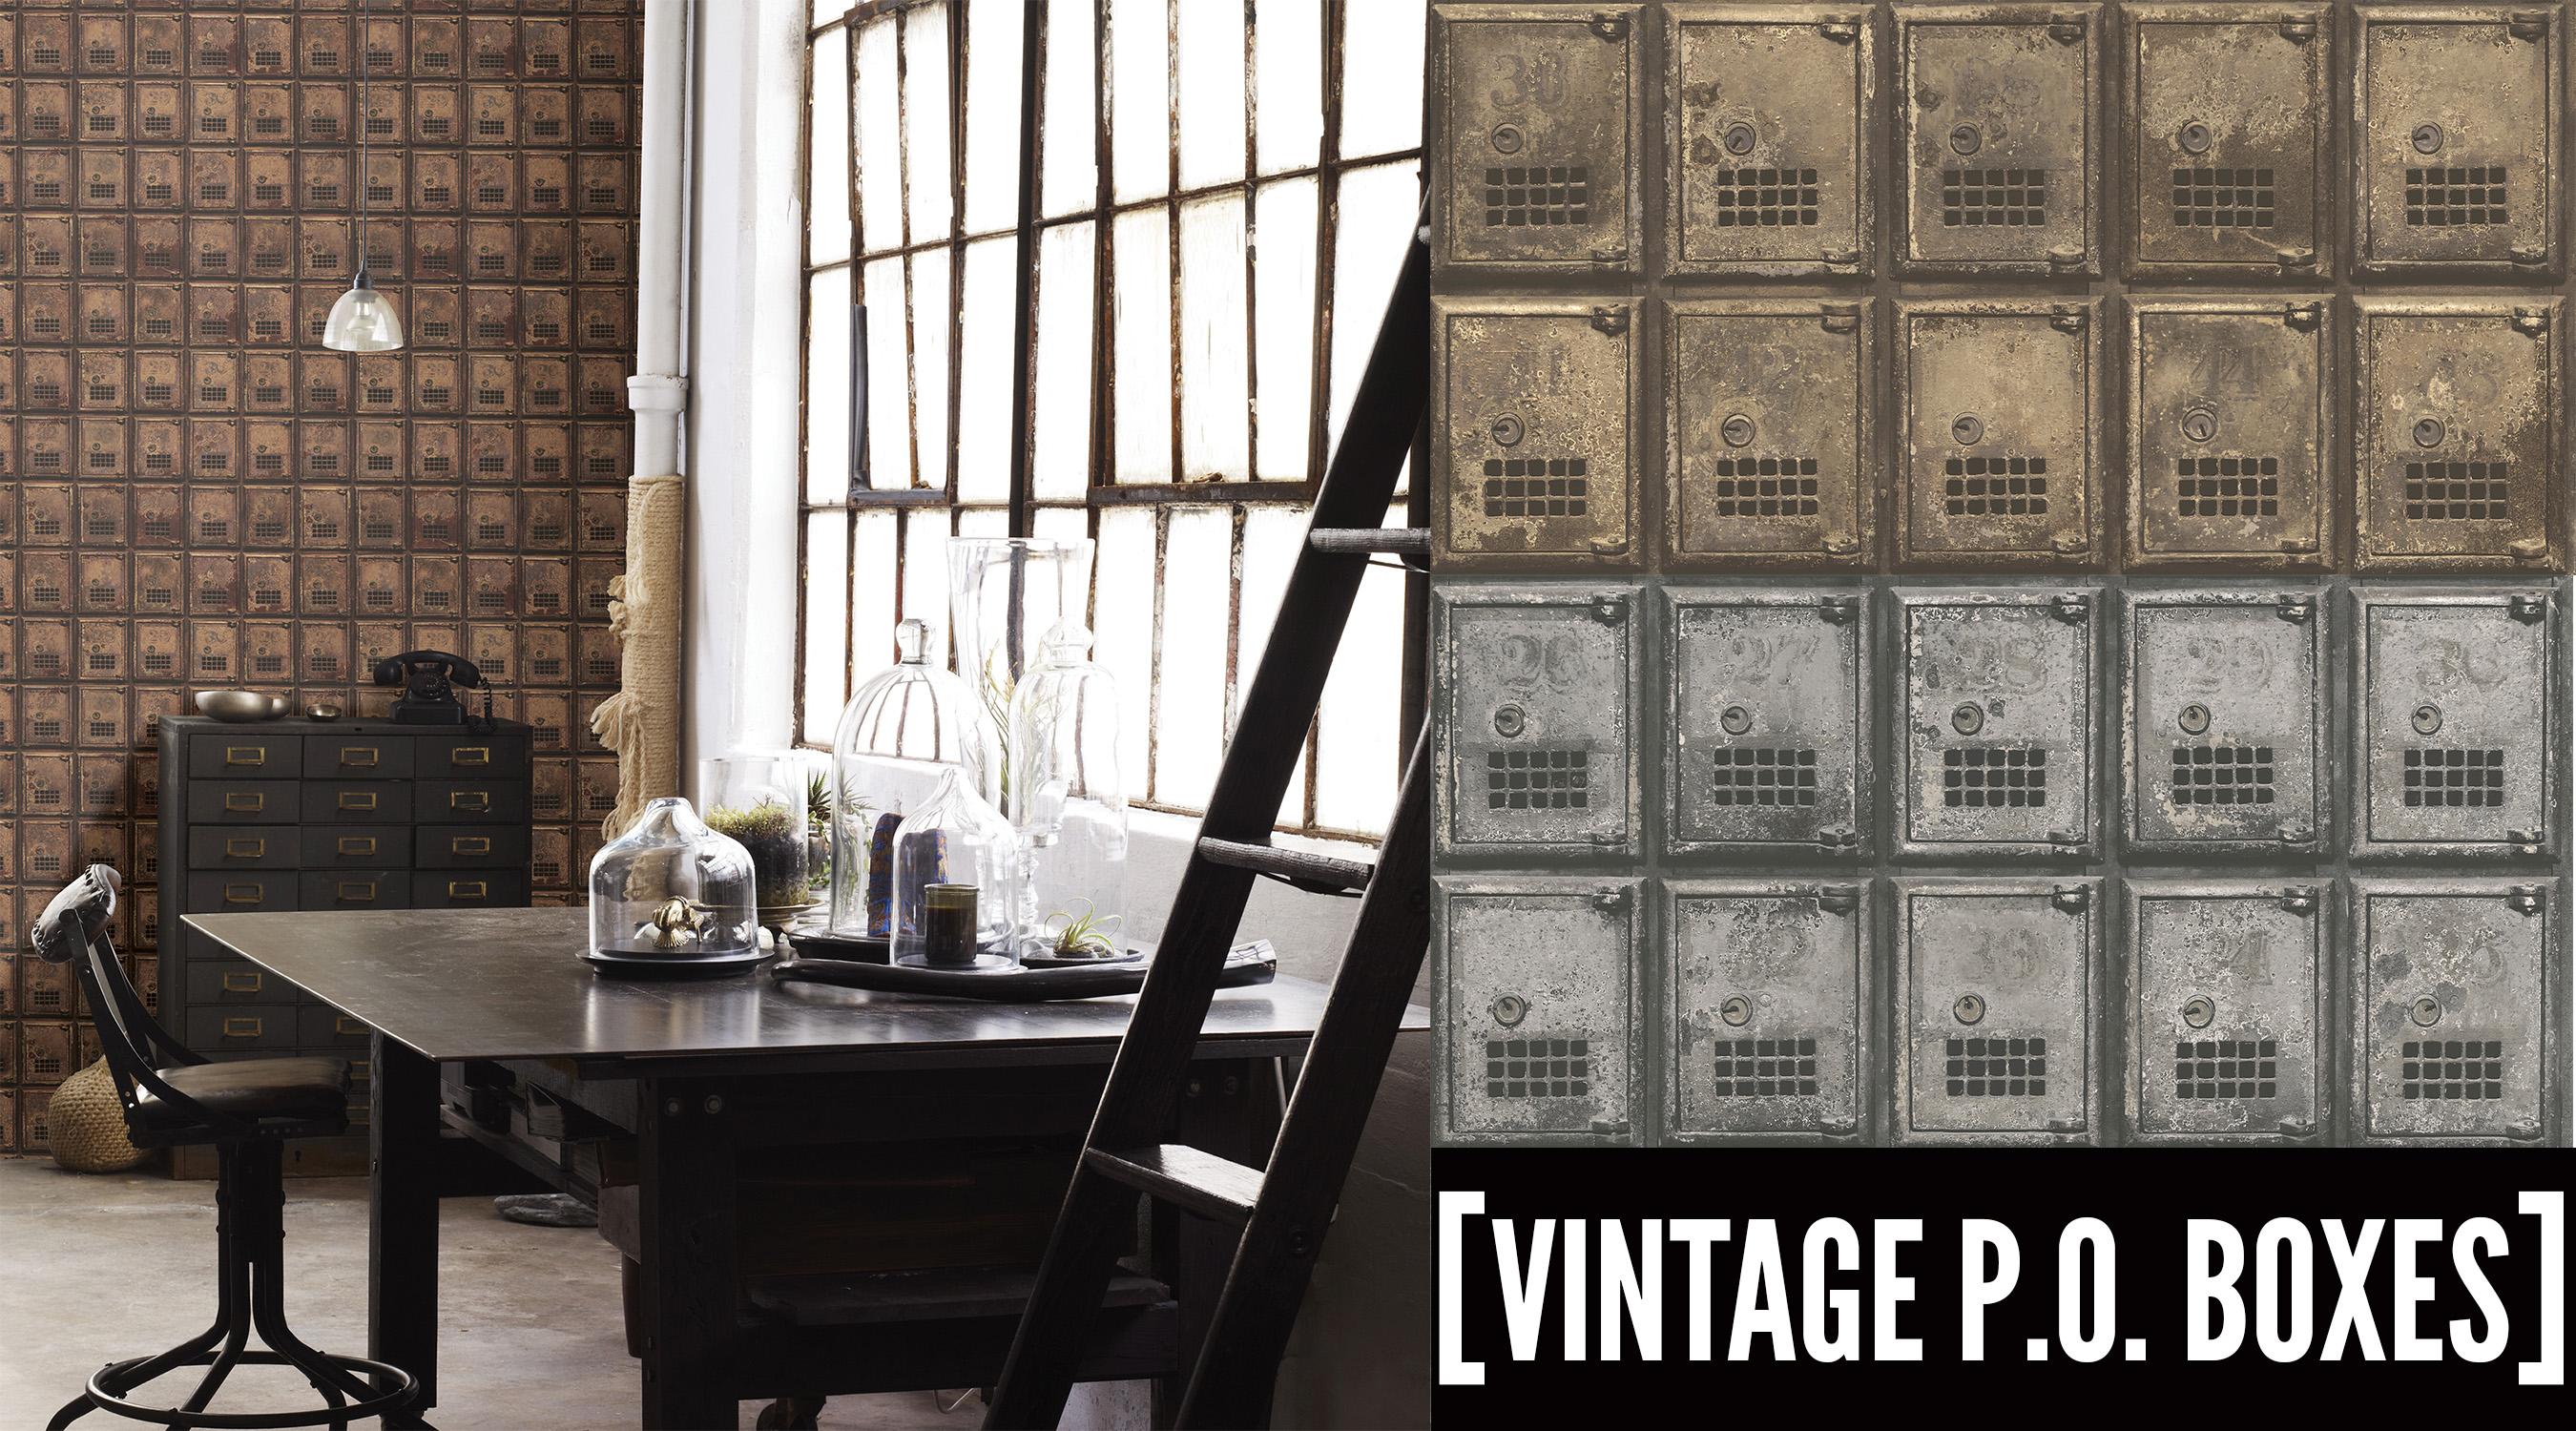 vintagepoboxes